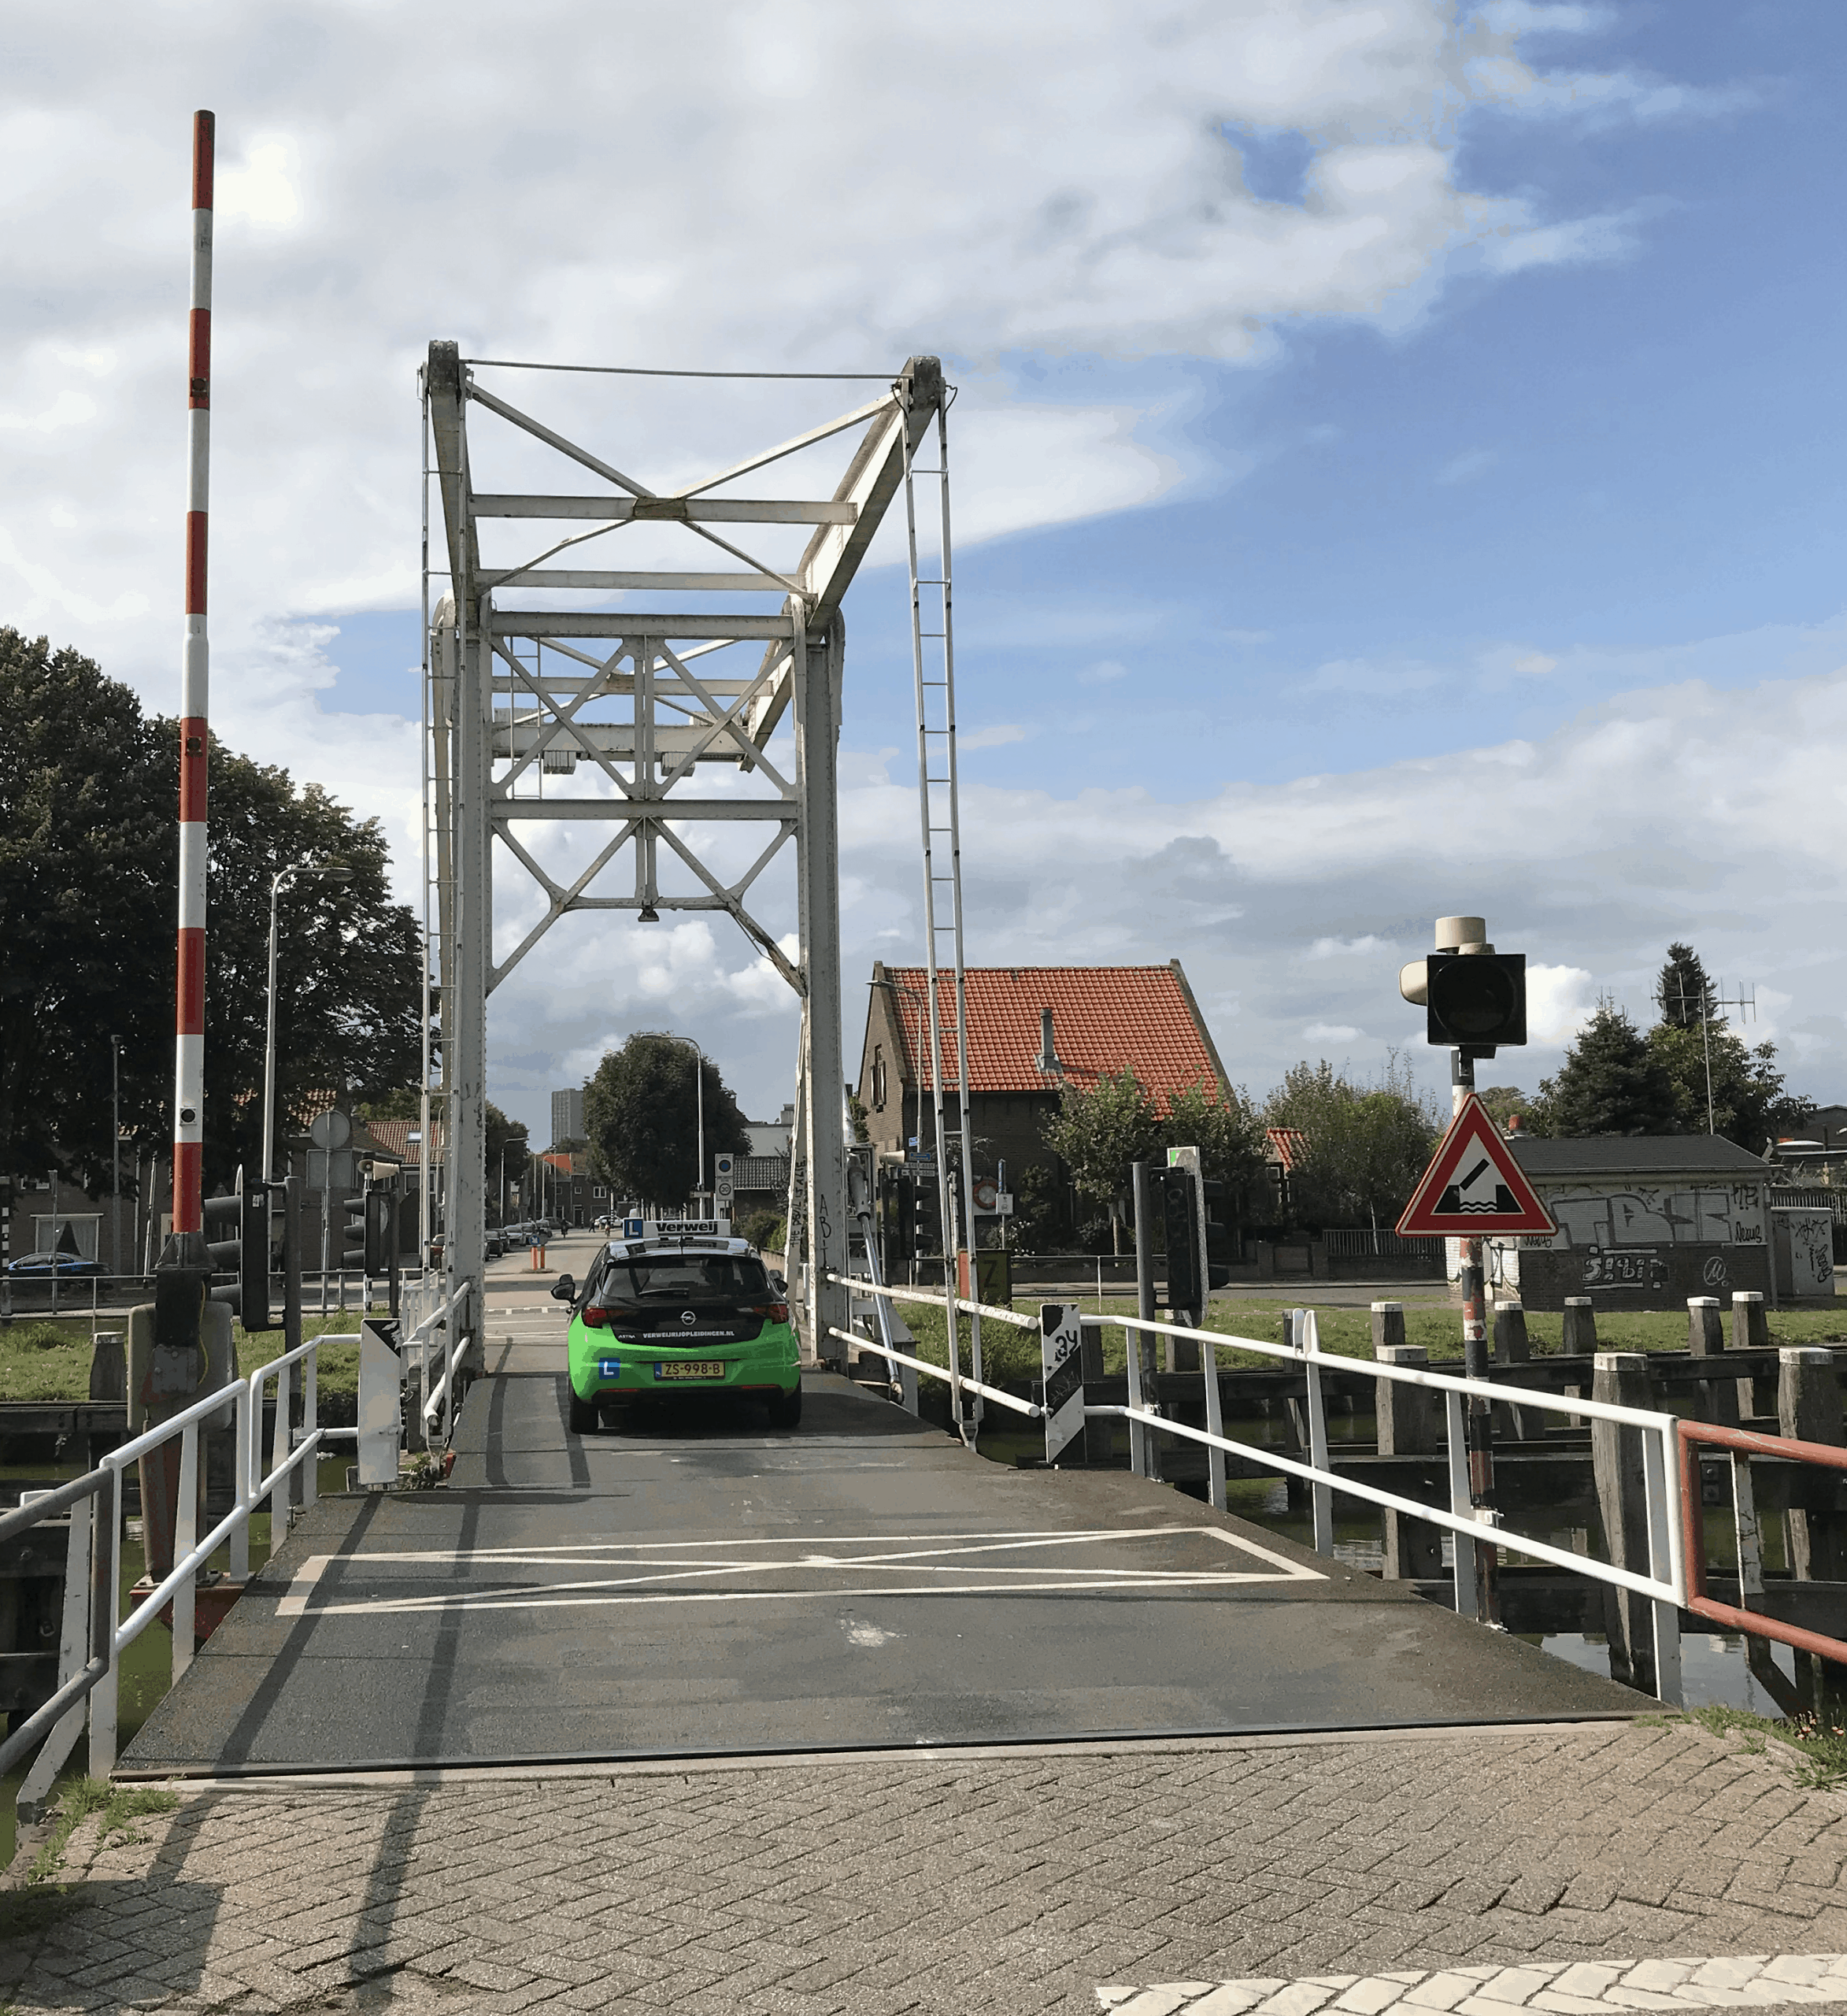 Rijles Tilburg Verweij Rijopleidingen